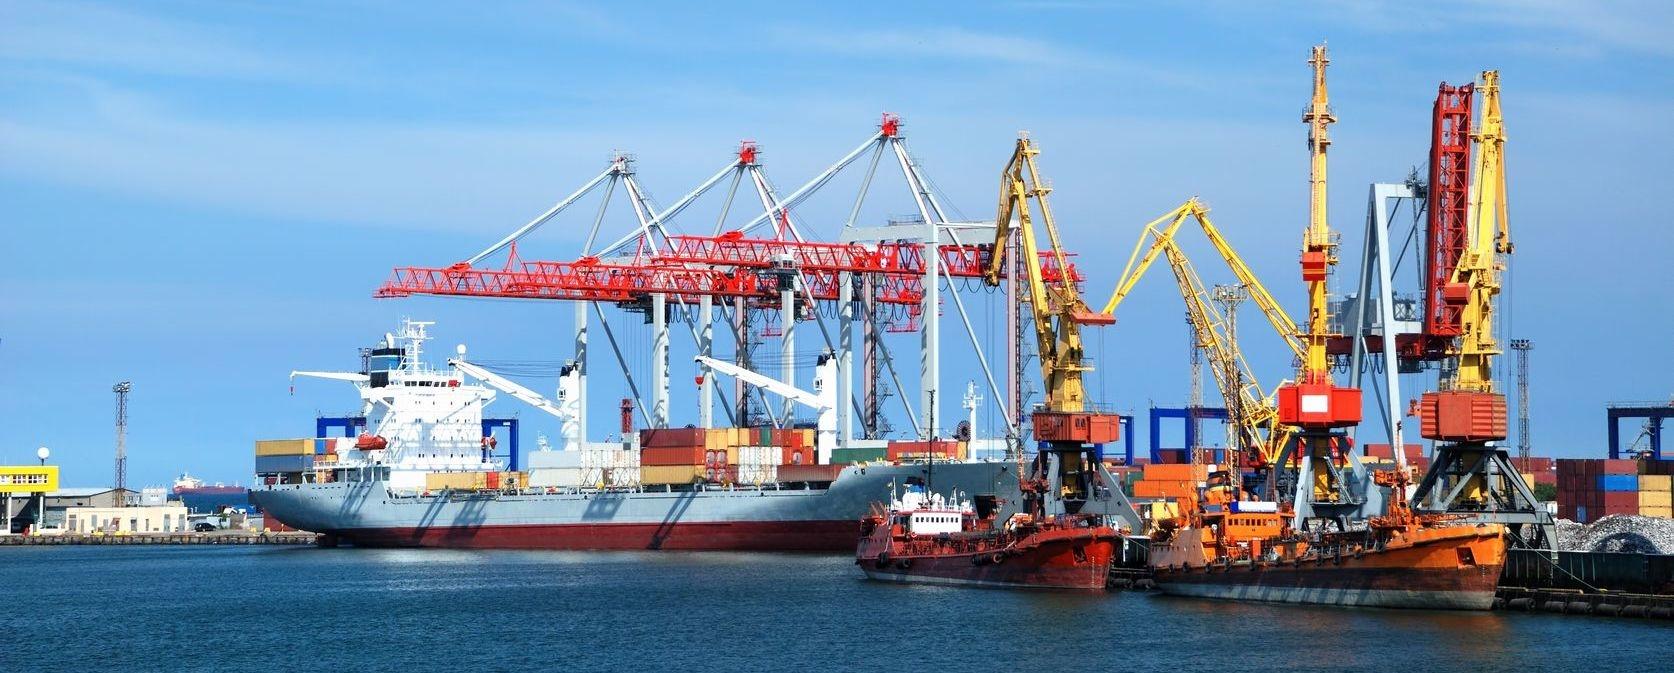 Marine Cargo Ship Carrier